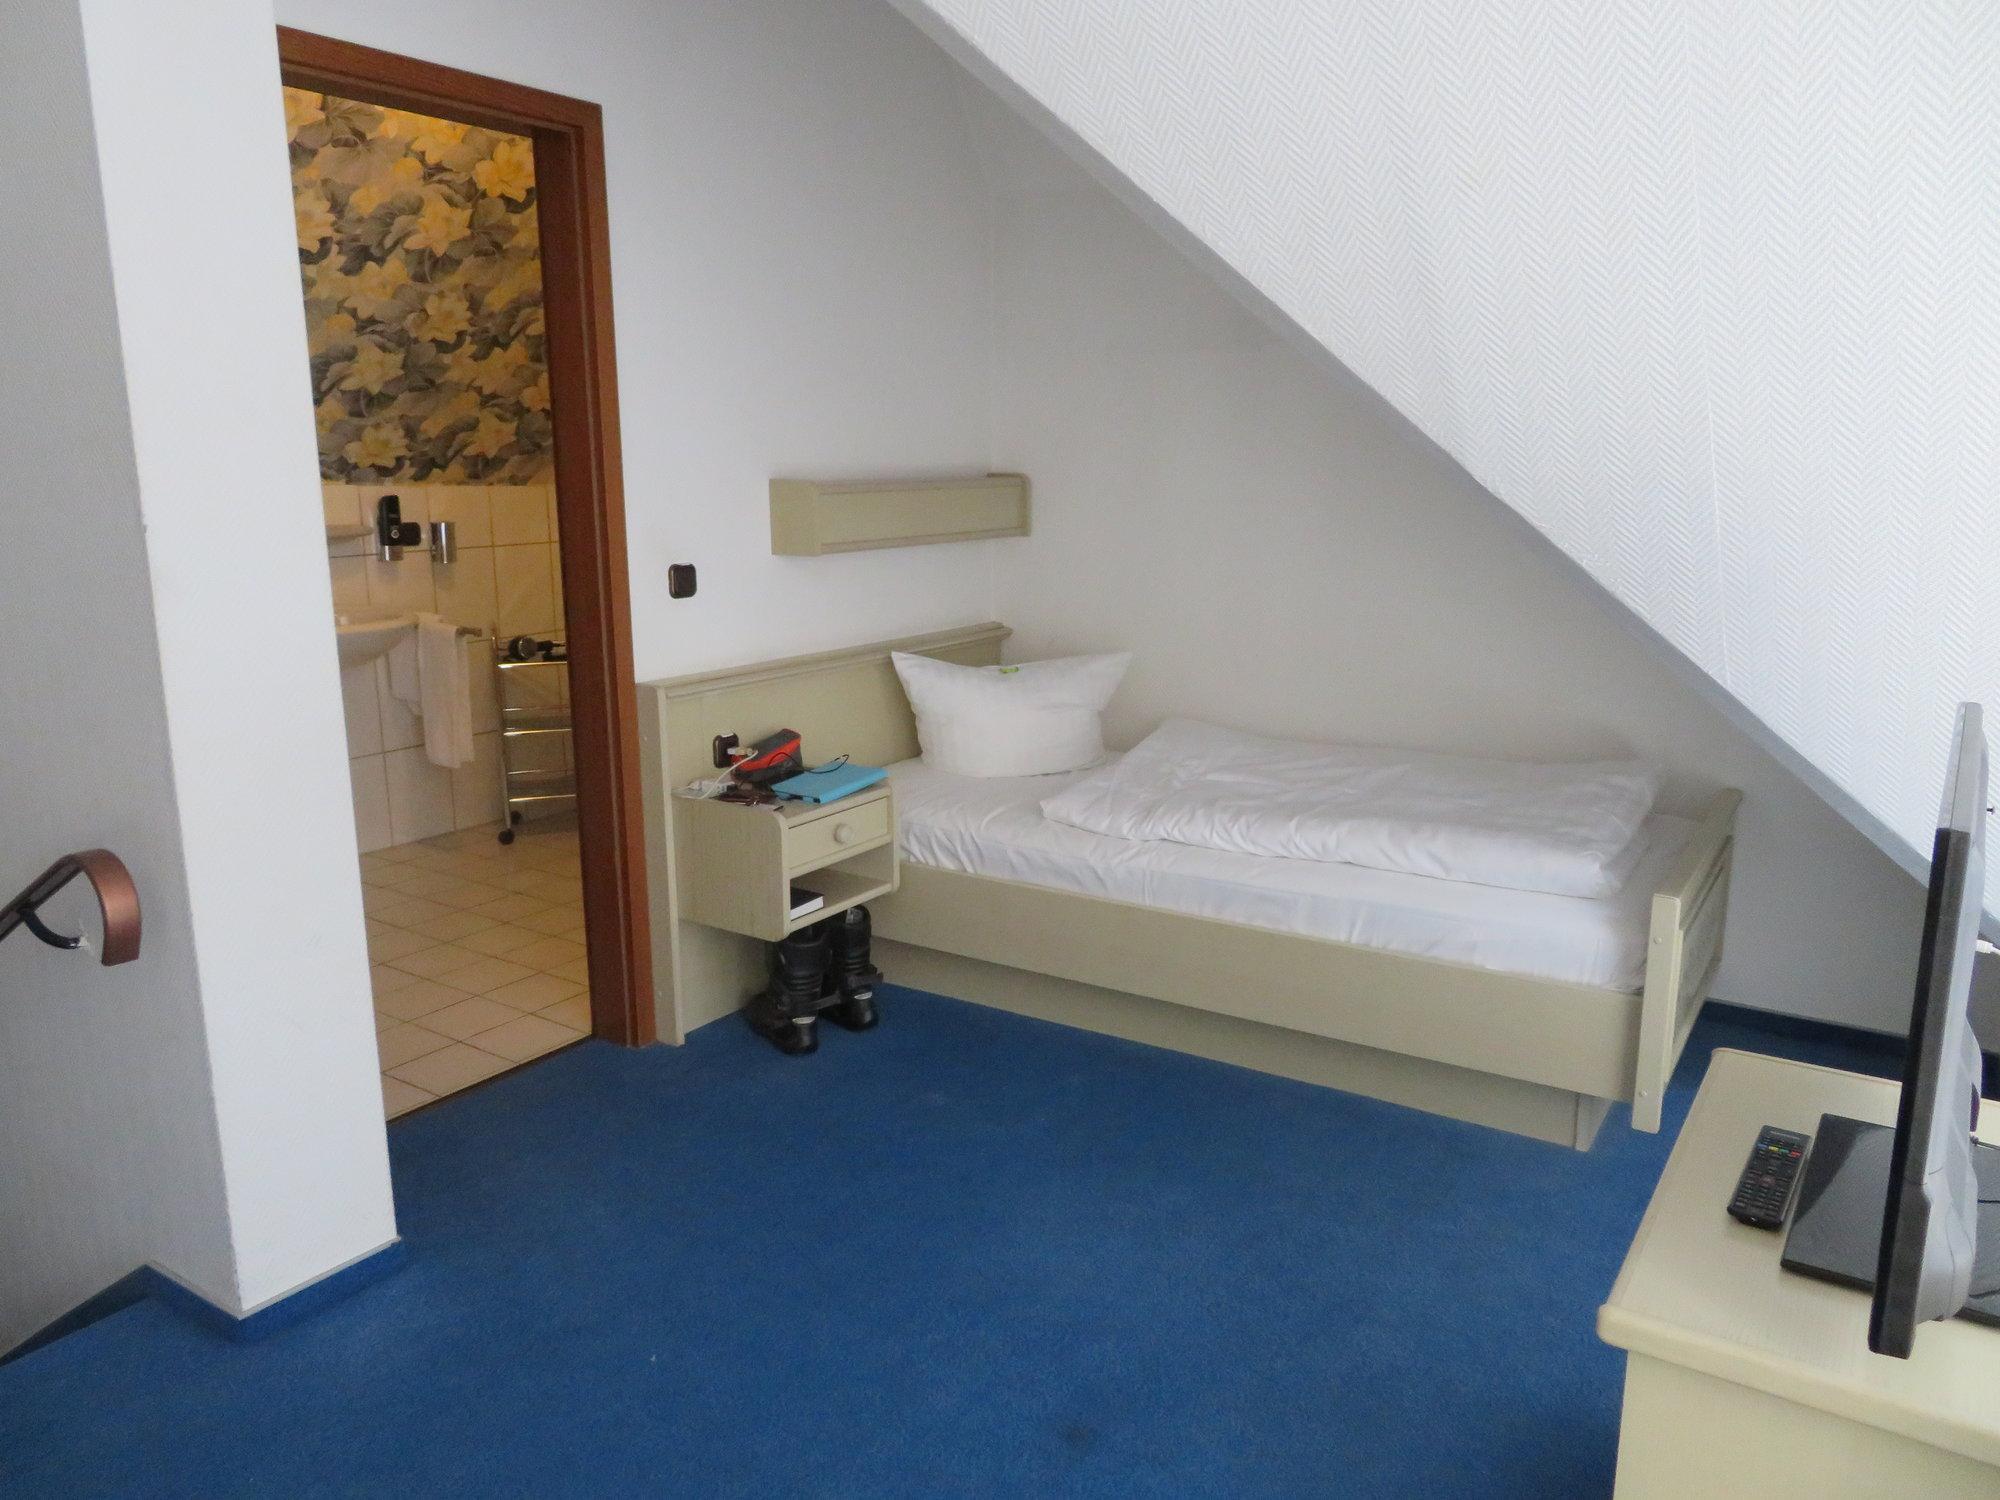 2019-07-04 Alter Wolf Hotel,  Wolfsburg Germany  3.JPG